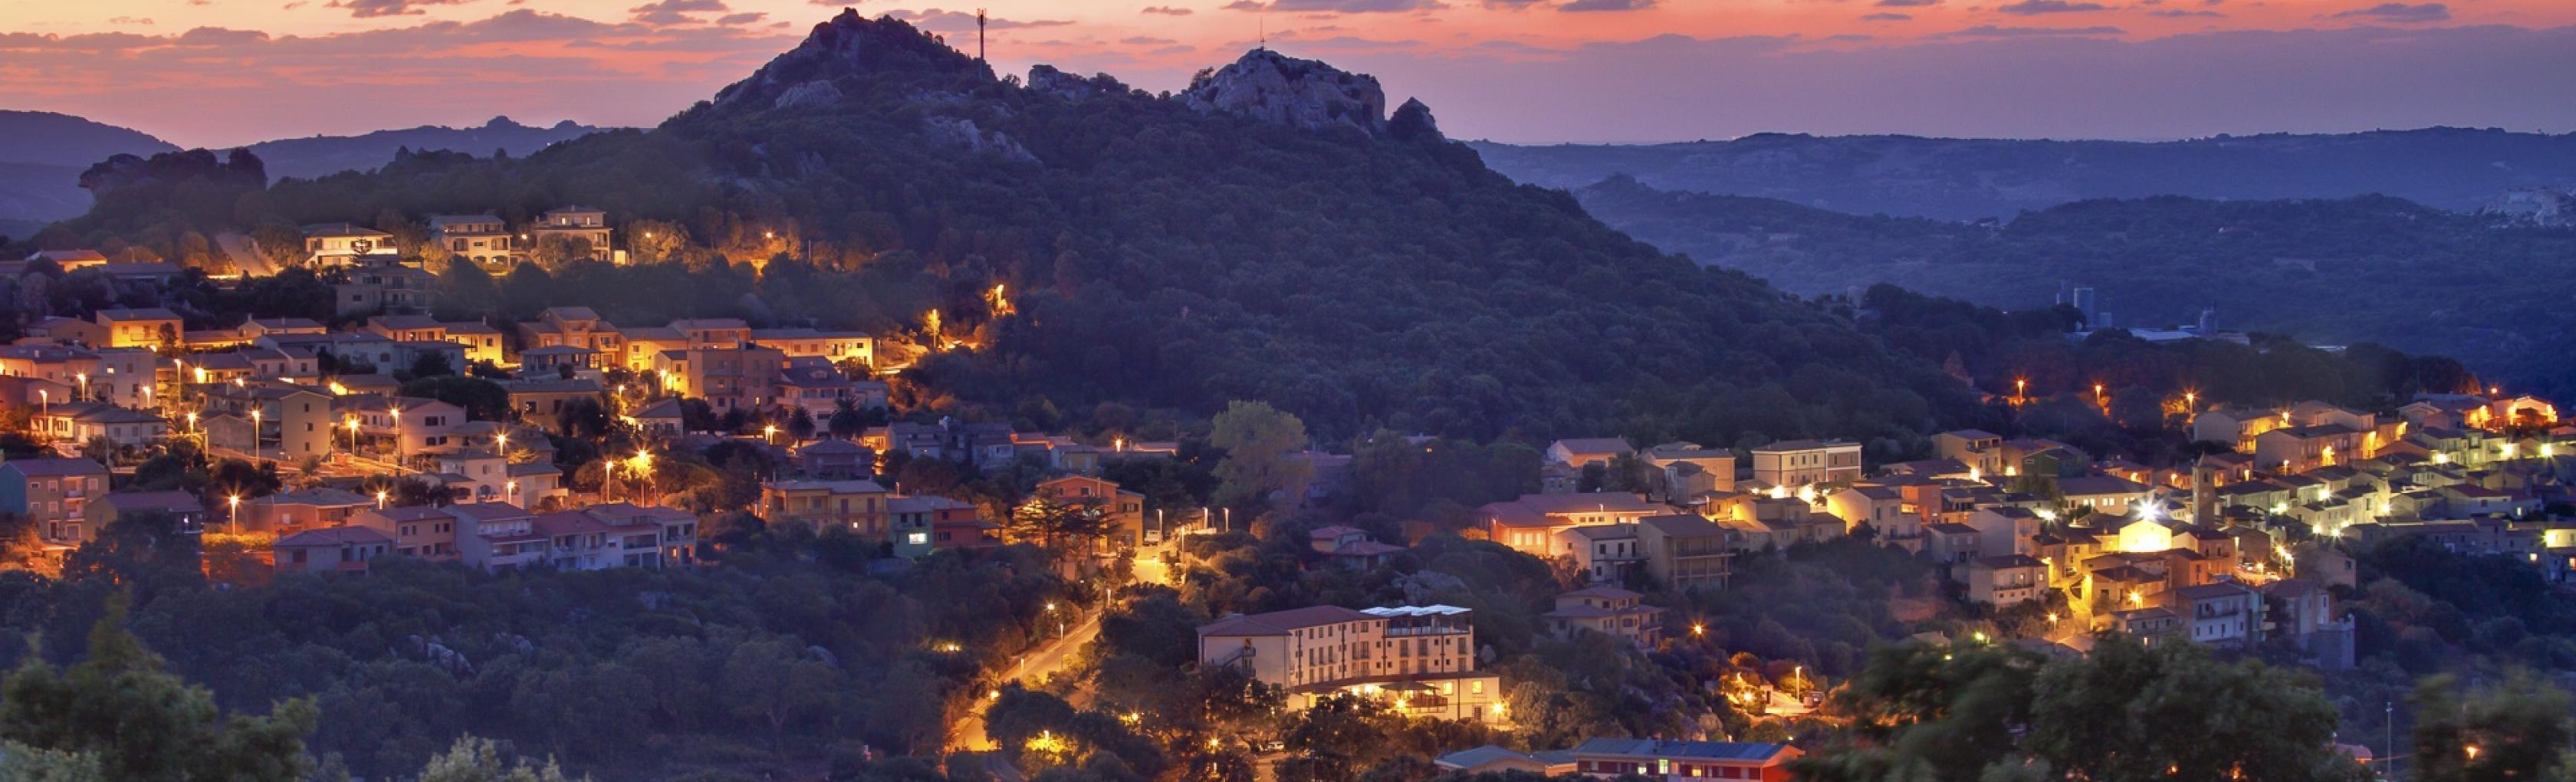 Veduta notturna di Luogosanto